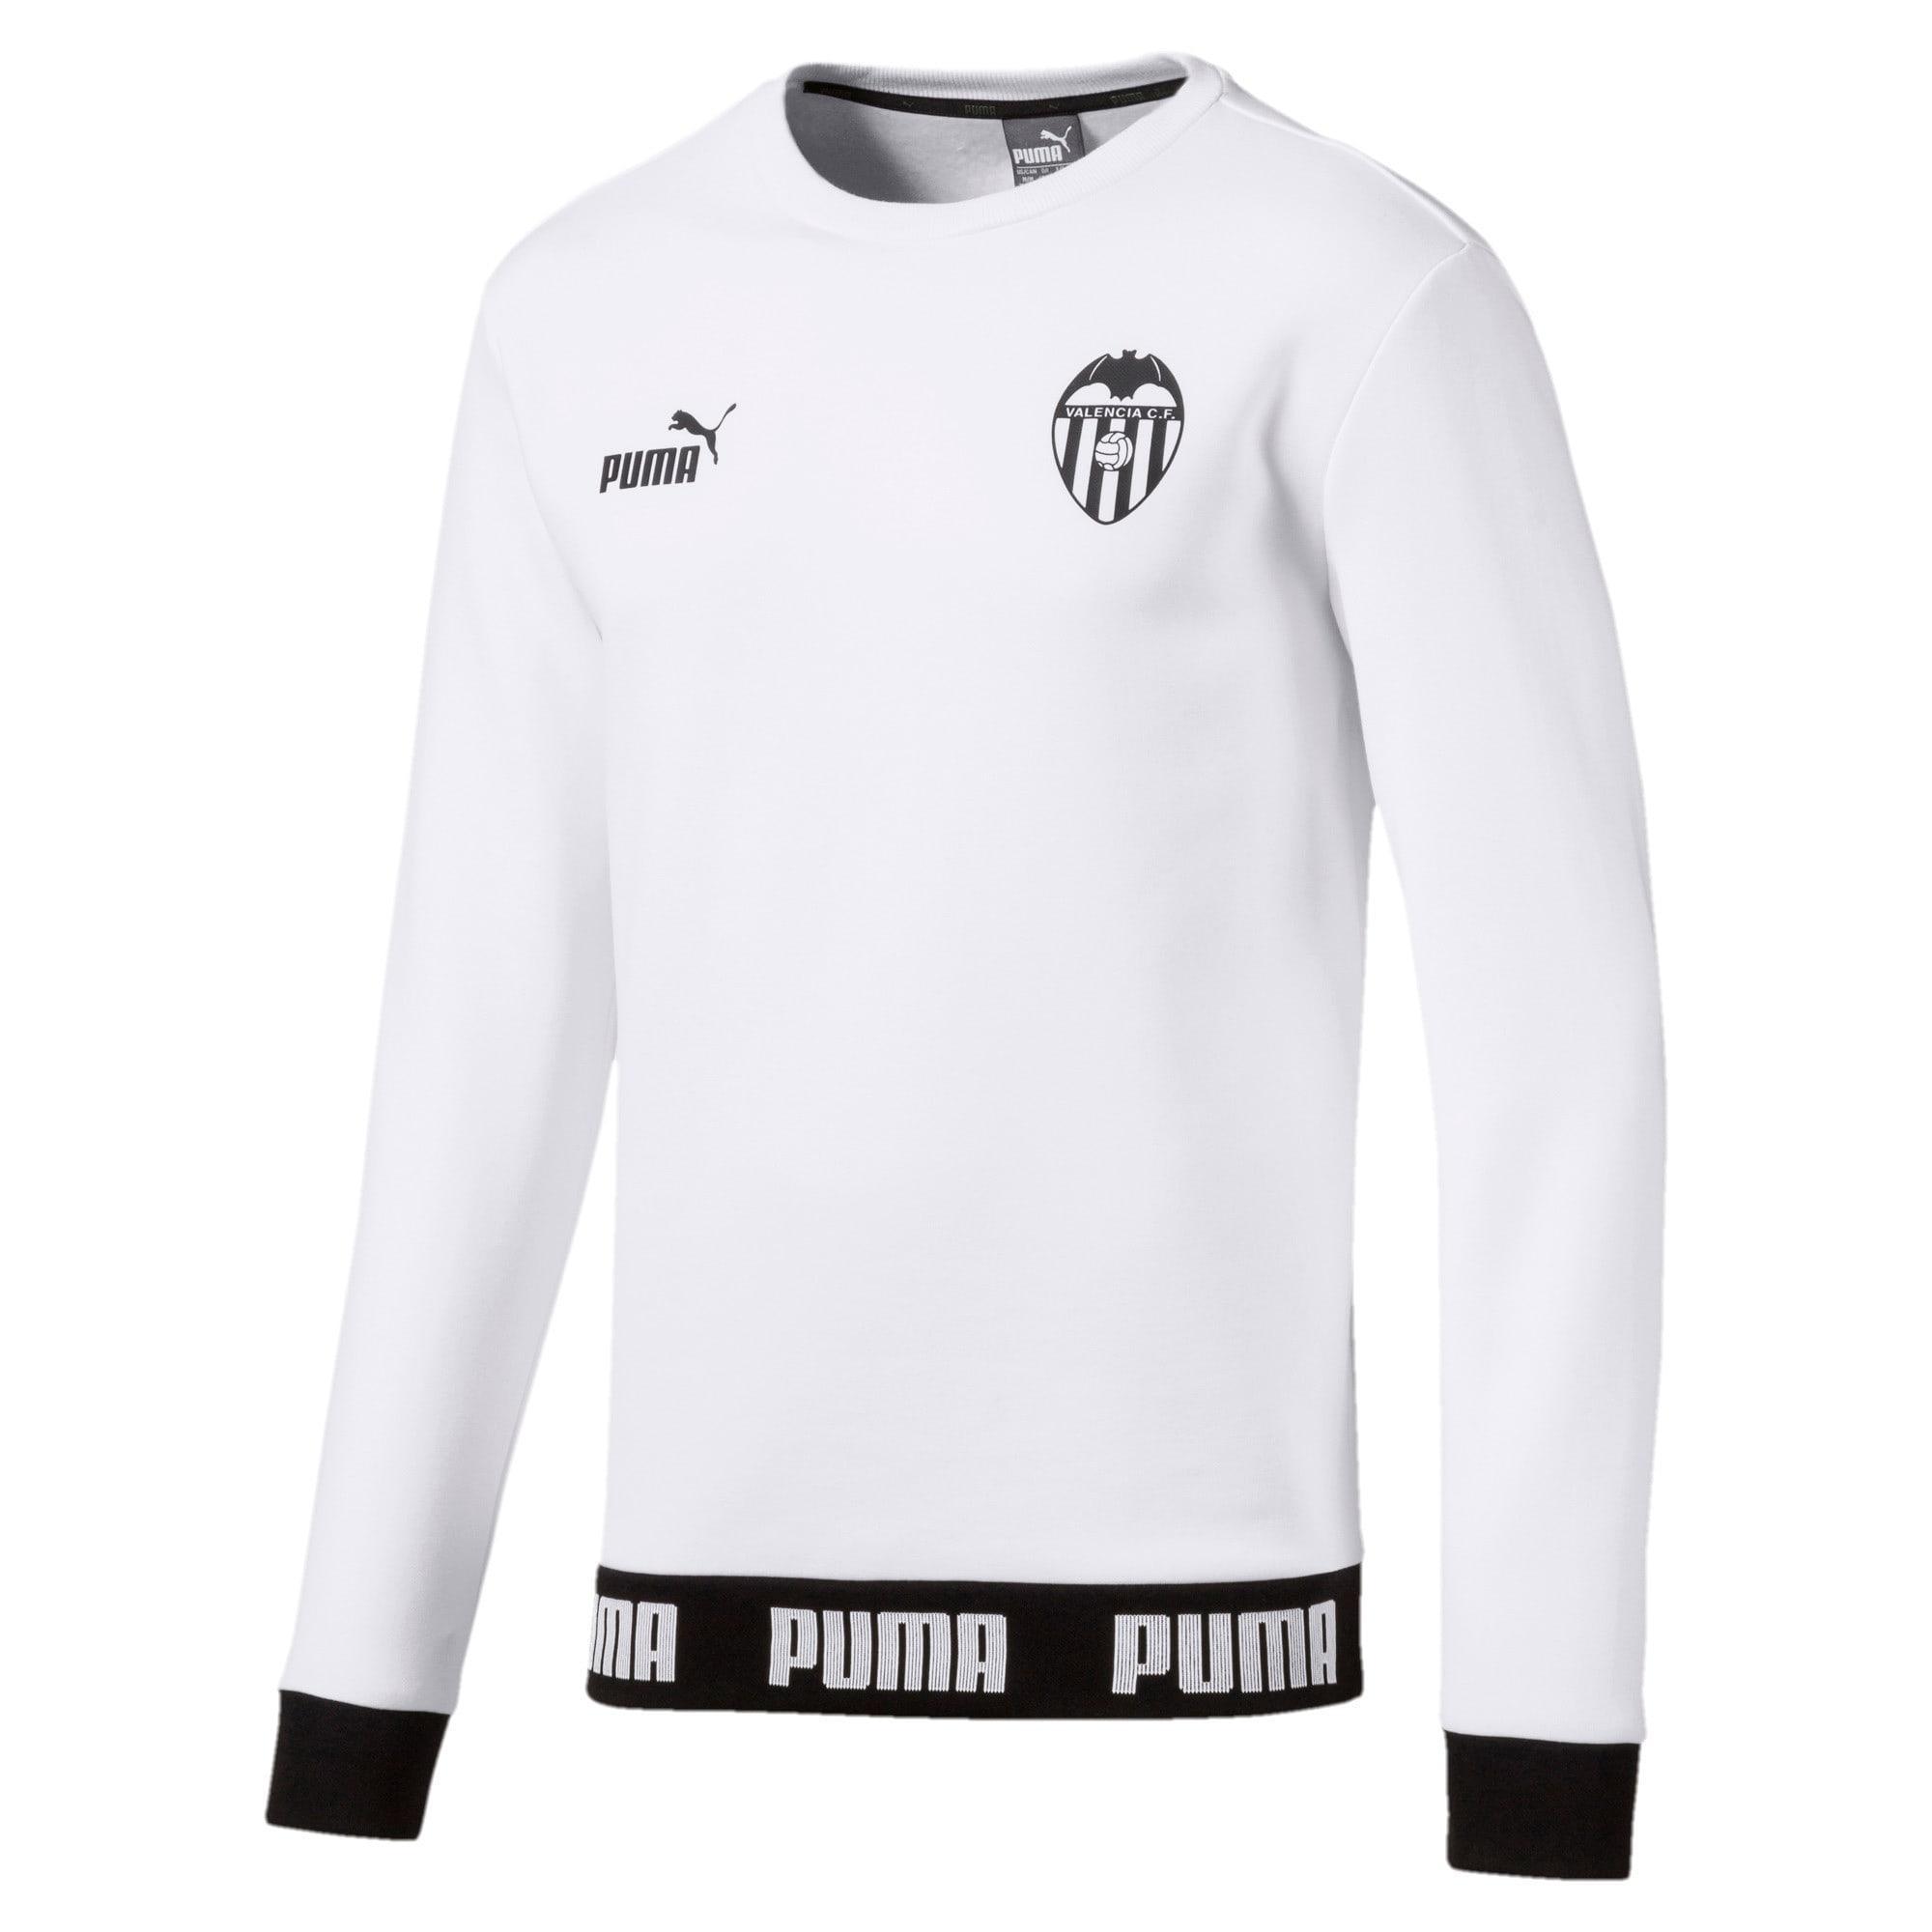 Thumbnail 1 of Valencia CF Football Culture Men's Sweater, Puma White, medium